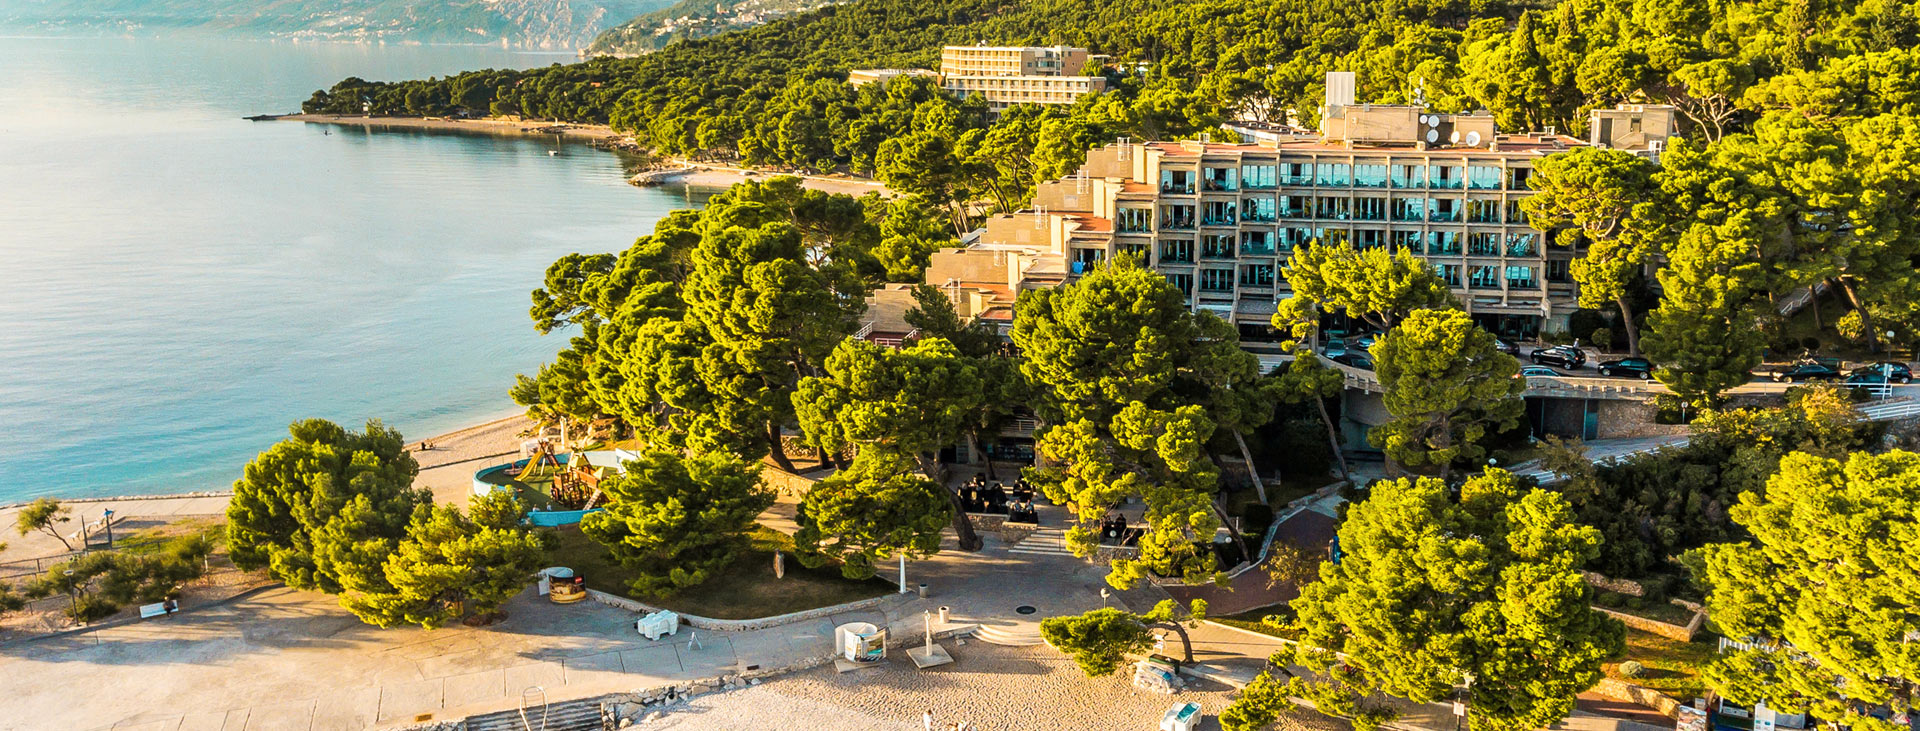 Bluesun Soline, Brela, Makarska Riviera, Kroatia